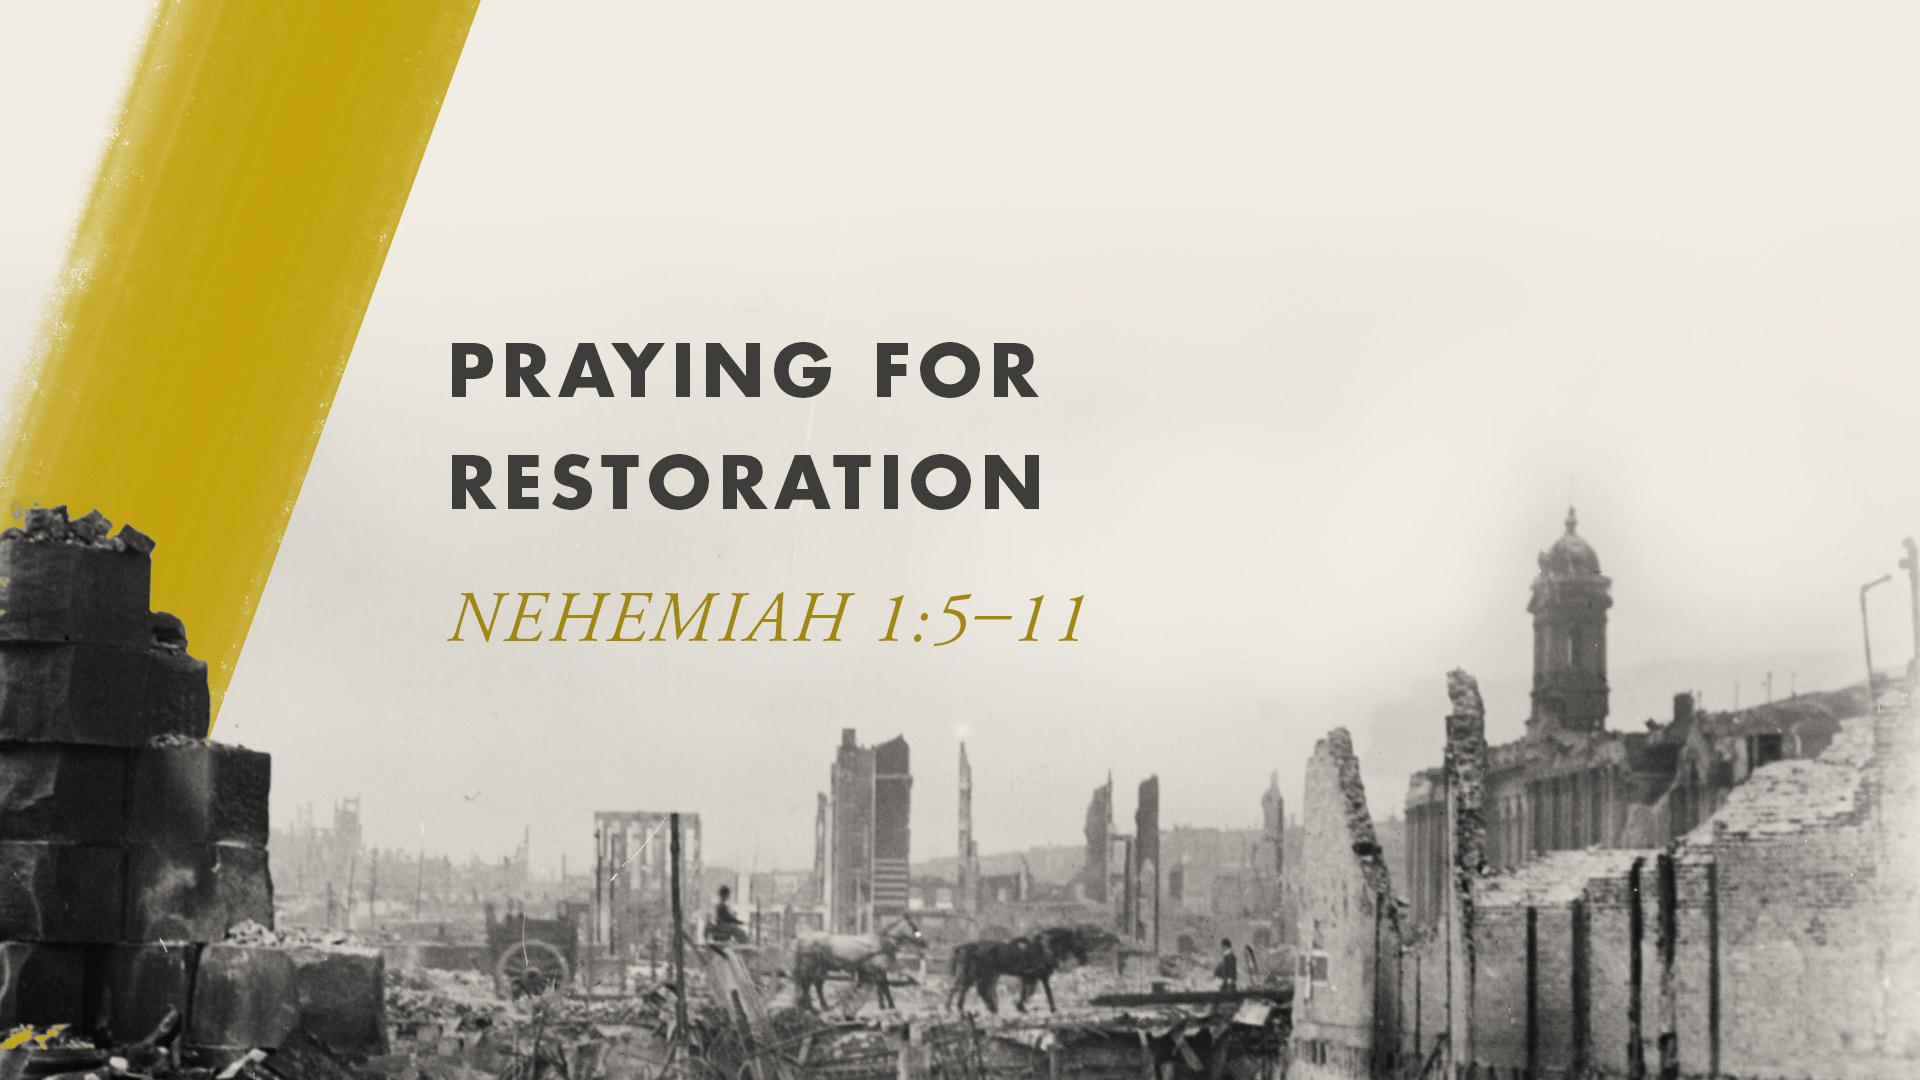 Praying for Restoration